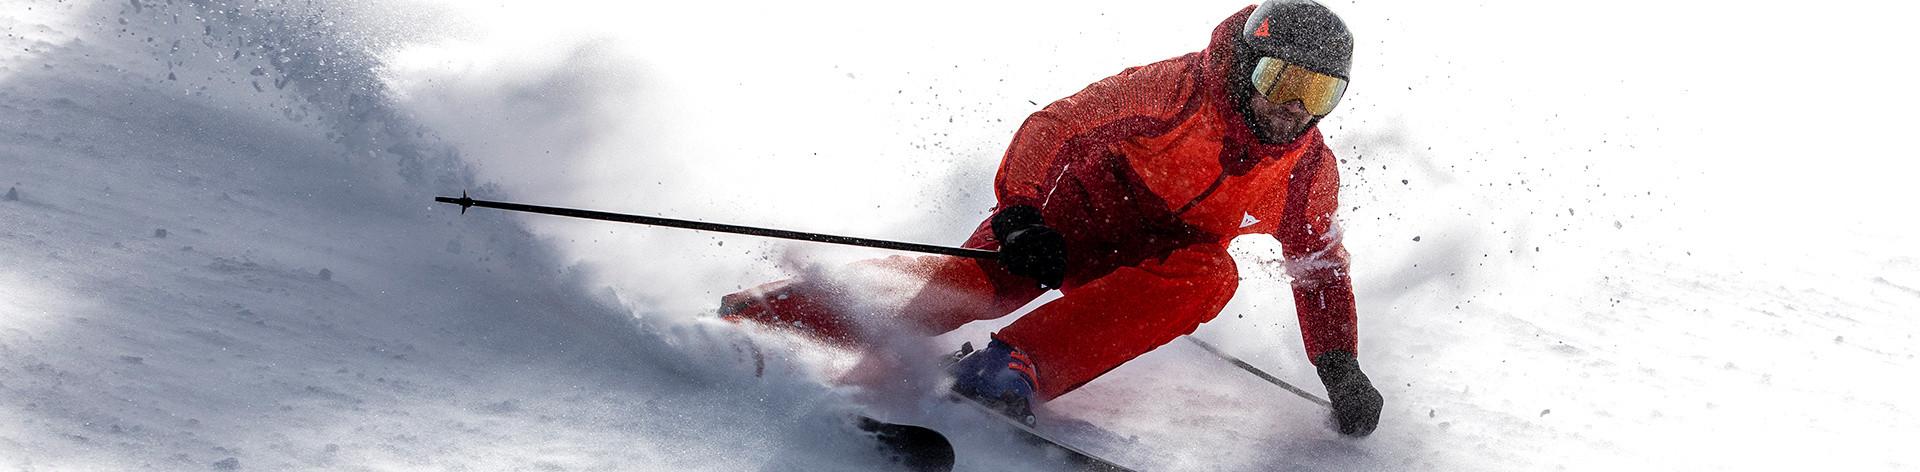 Dainese Winter Sports